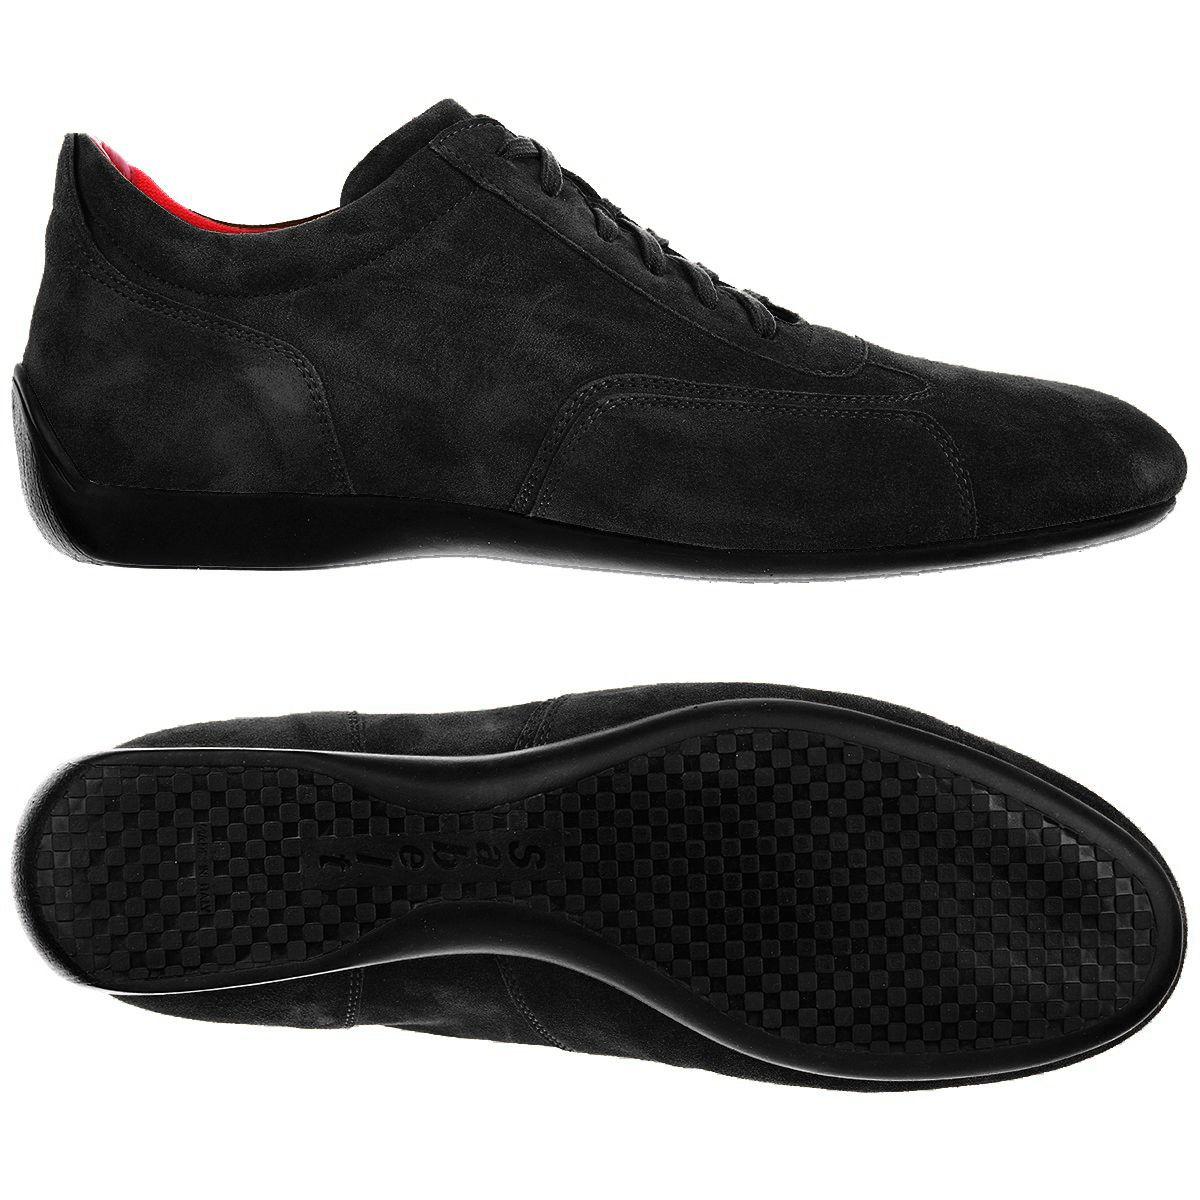 online sale of the sabelt italian men and women shoes 103u granturismo suede.